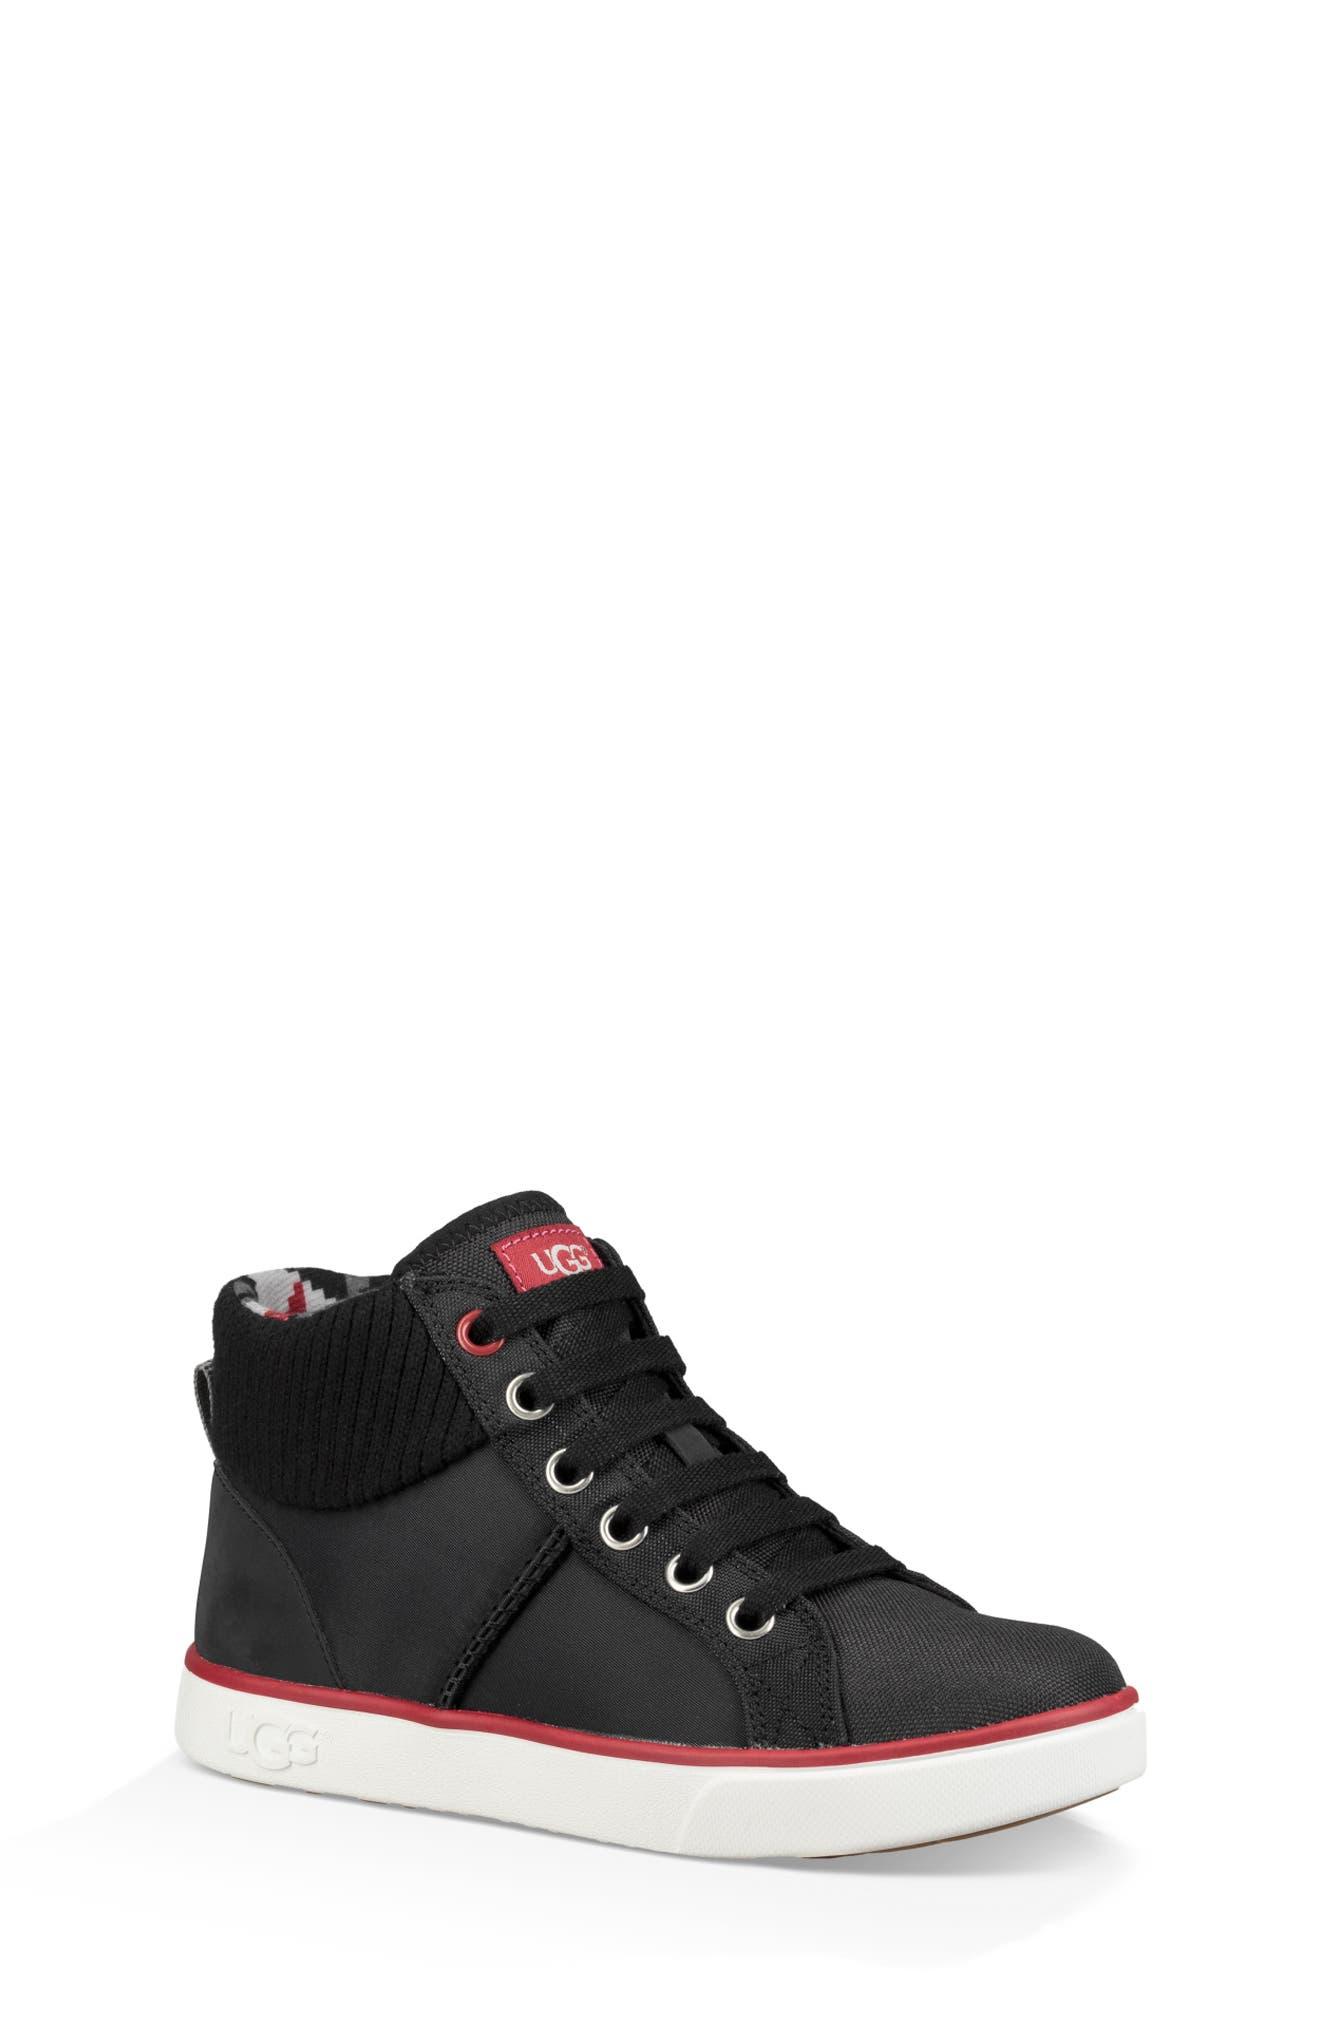 UGG<SUP>®</SUP>, Boscoe Sneaker, Main thumbnail 1, color, 001